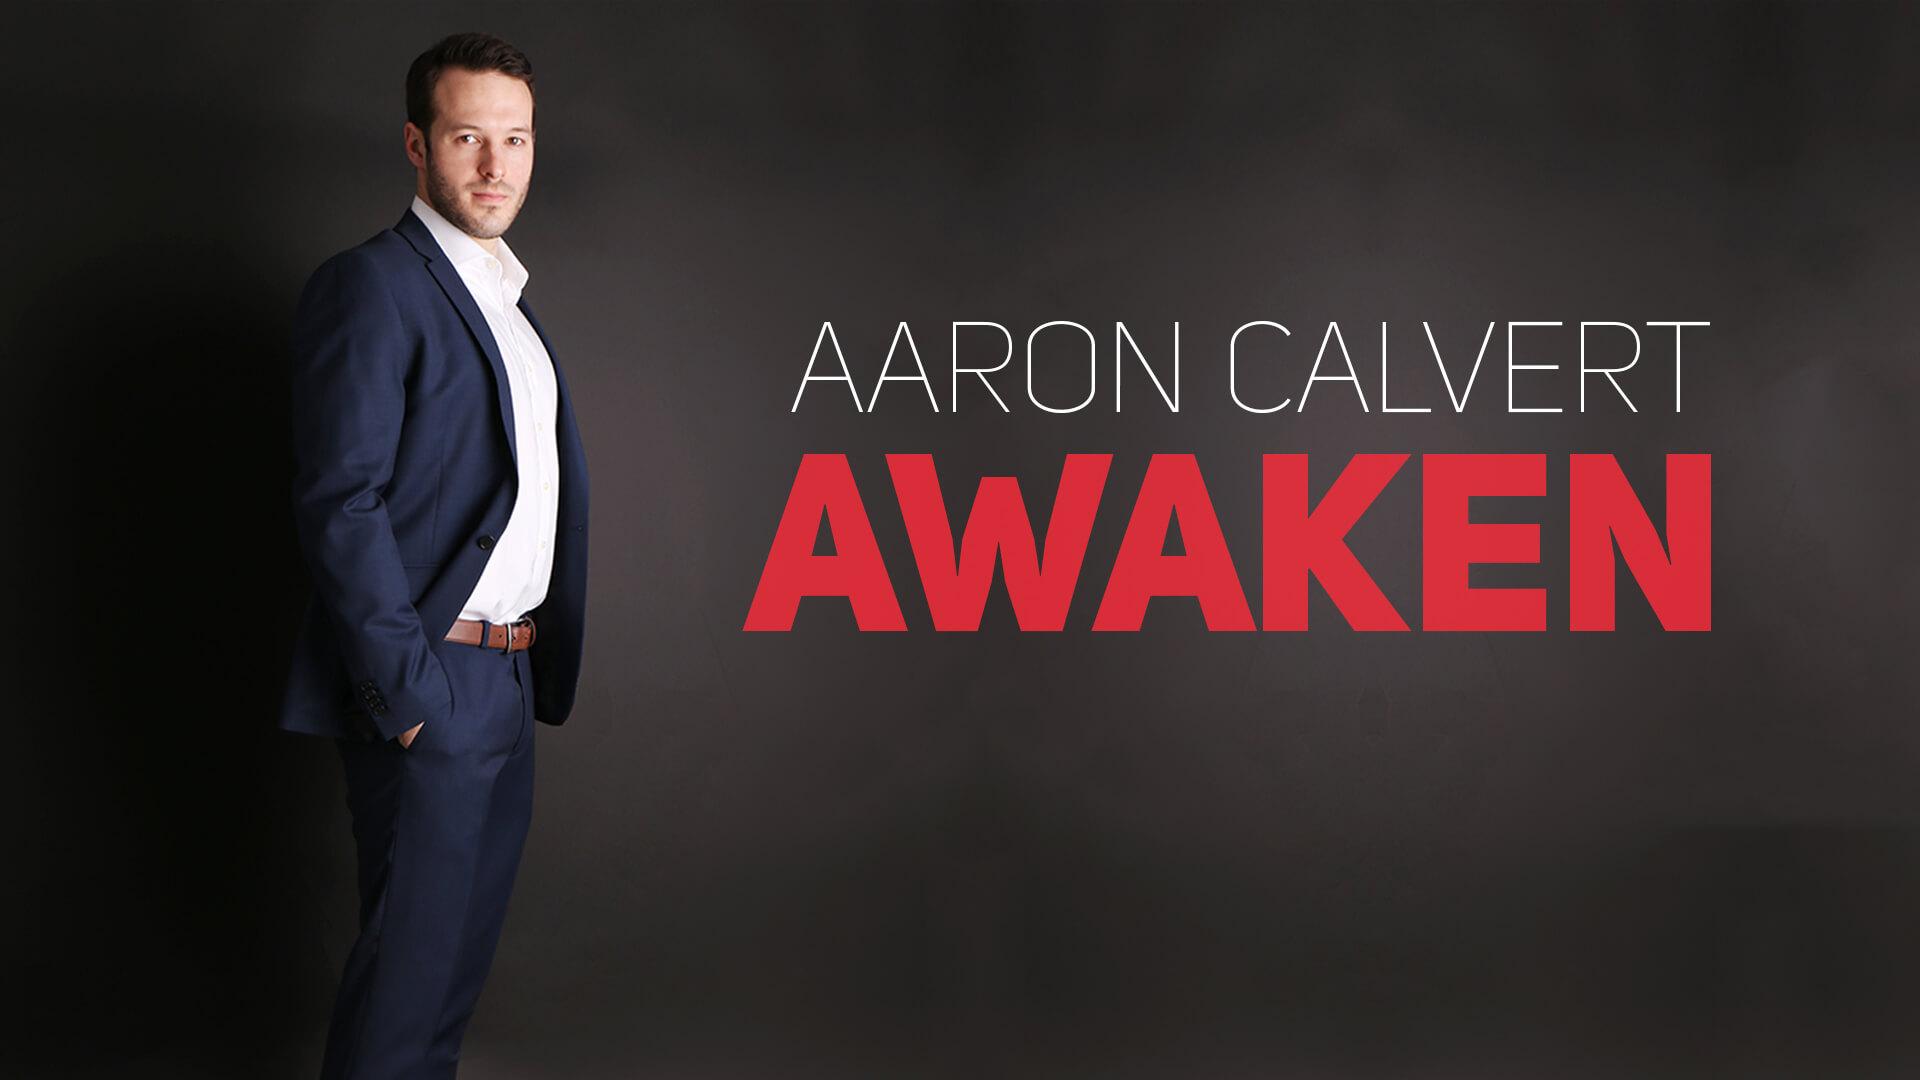 Aaron Calvert AWAKEN Edinburgh Fringe Festival Magic Preview